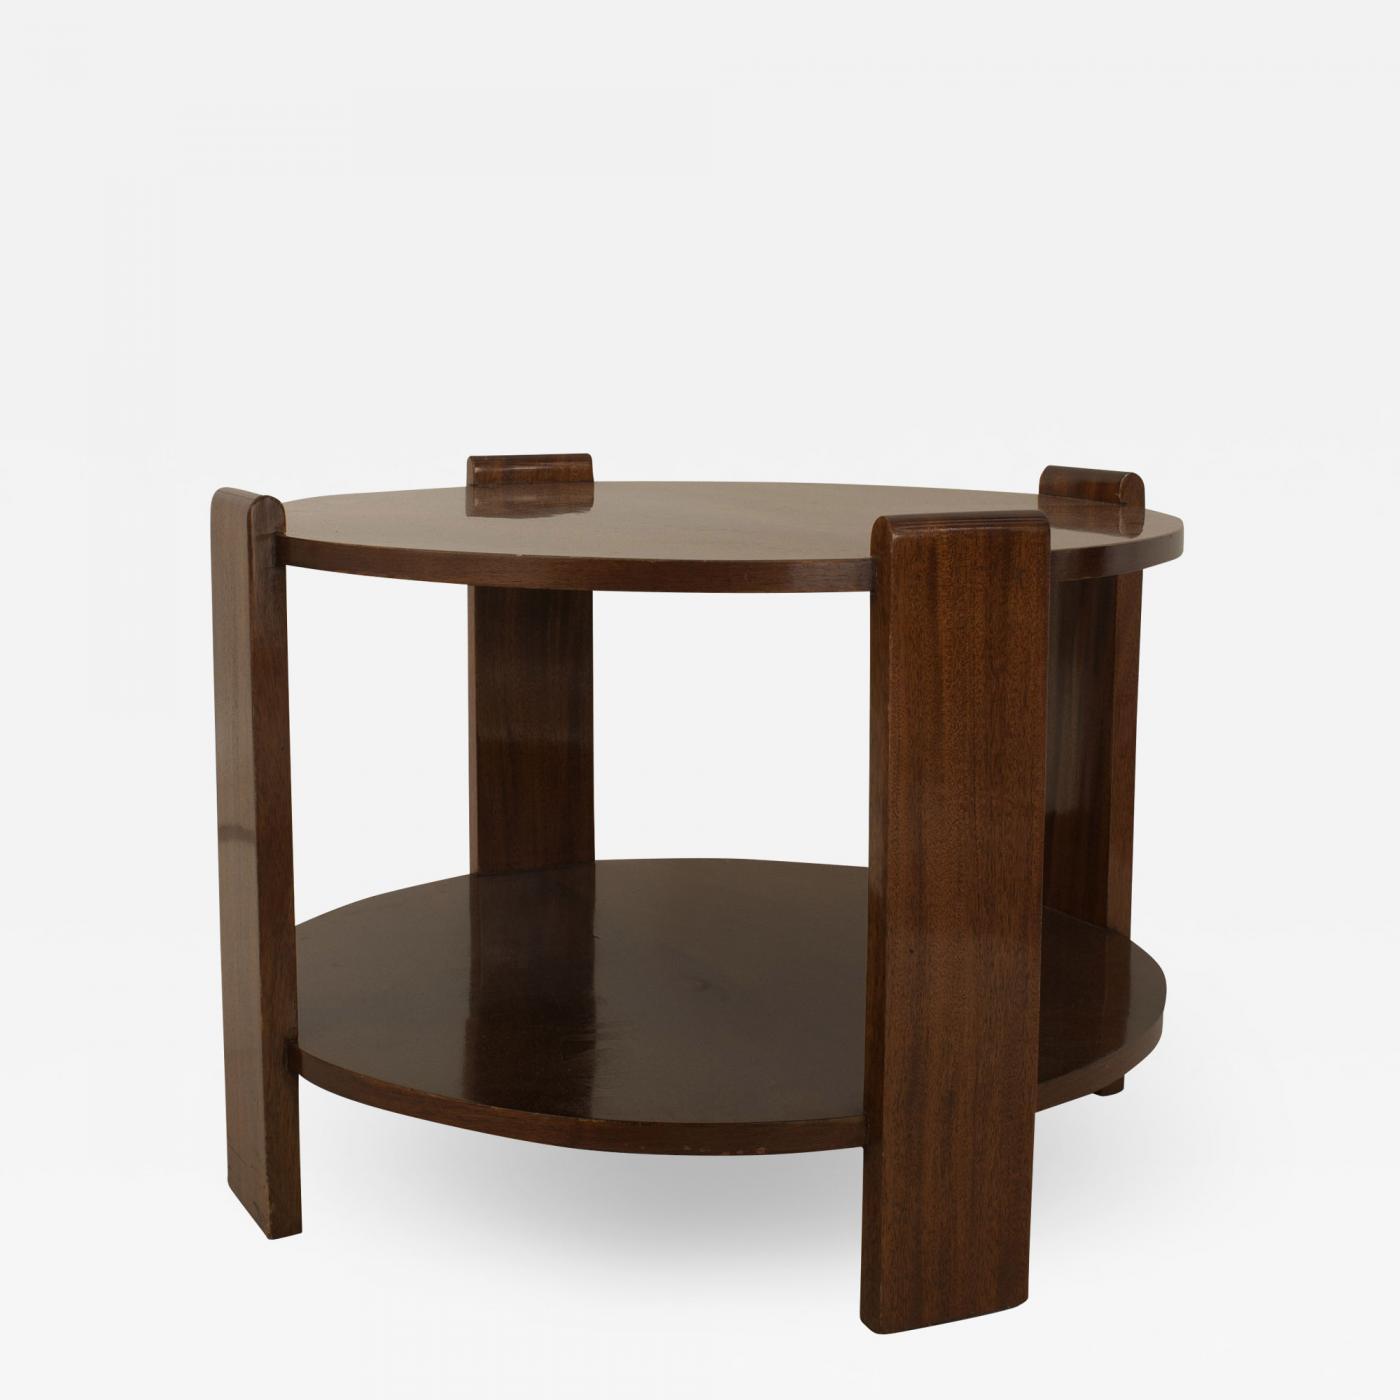 French Art Deco Round Mahogany Coffee Table